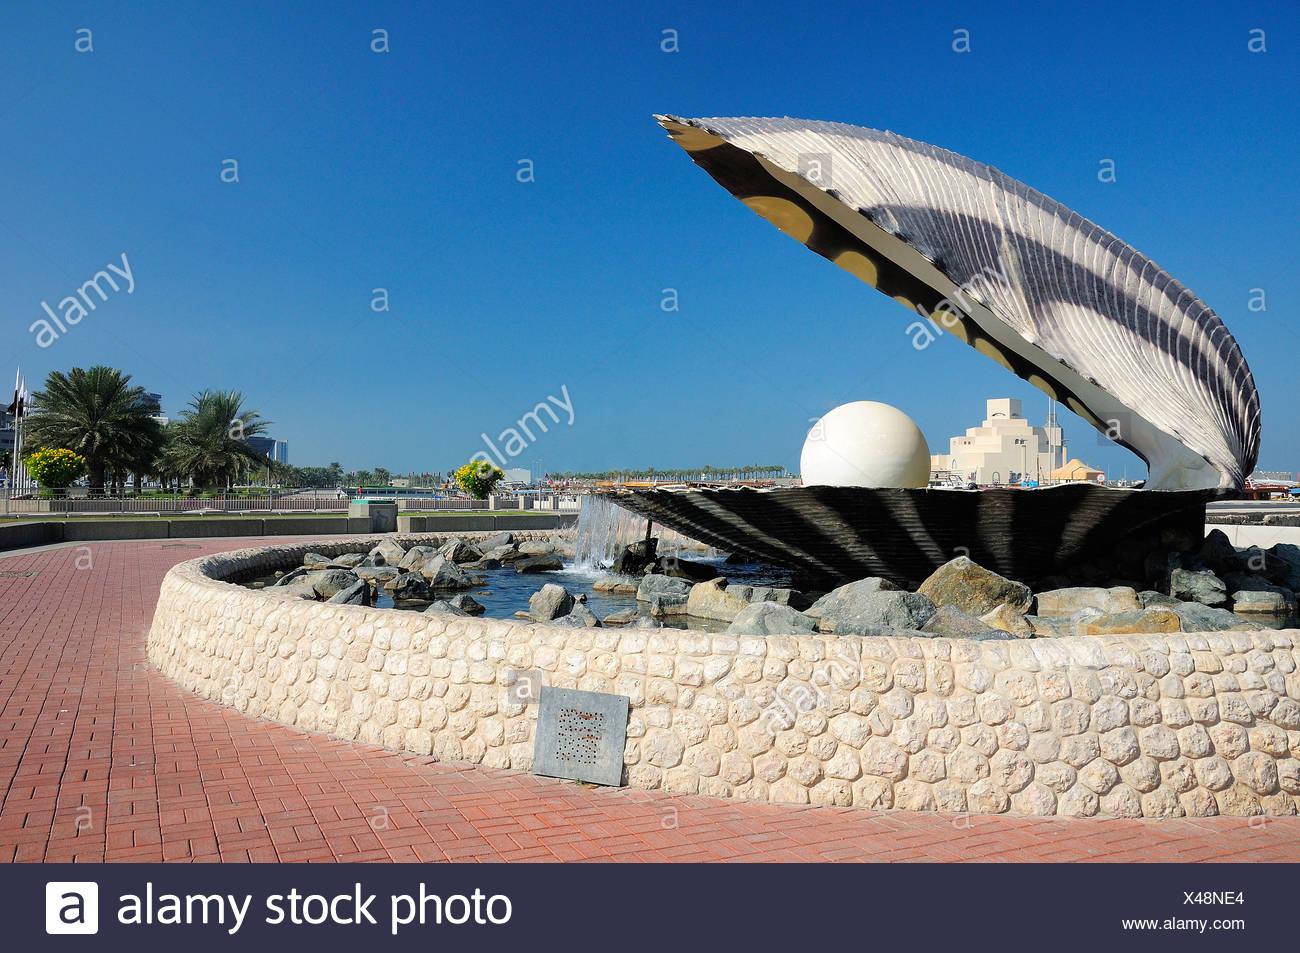 Pearl Oyster et Fontaine, corniche, Doha, Qatar, Moyen-Orient Photo Stock